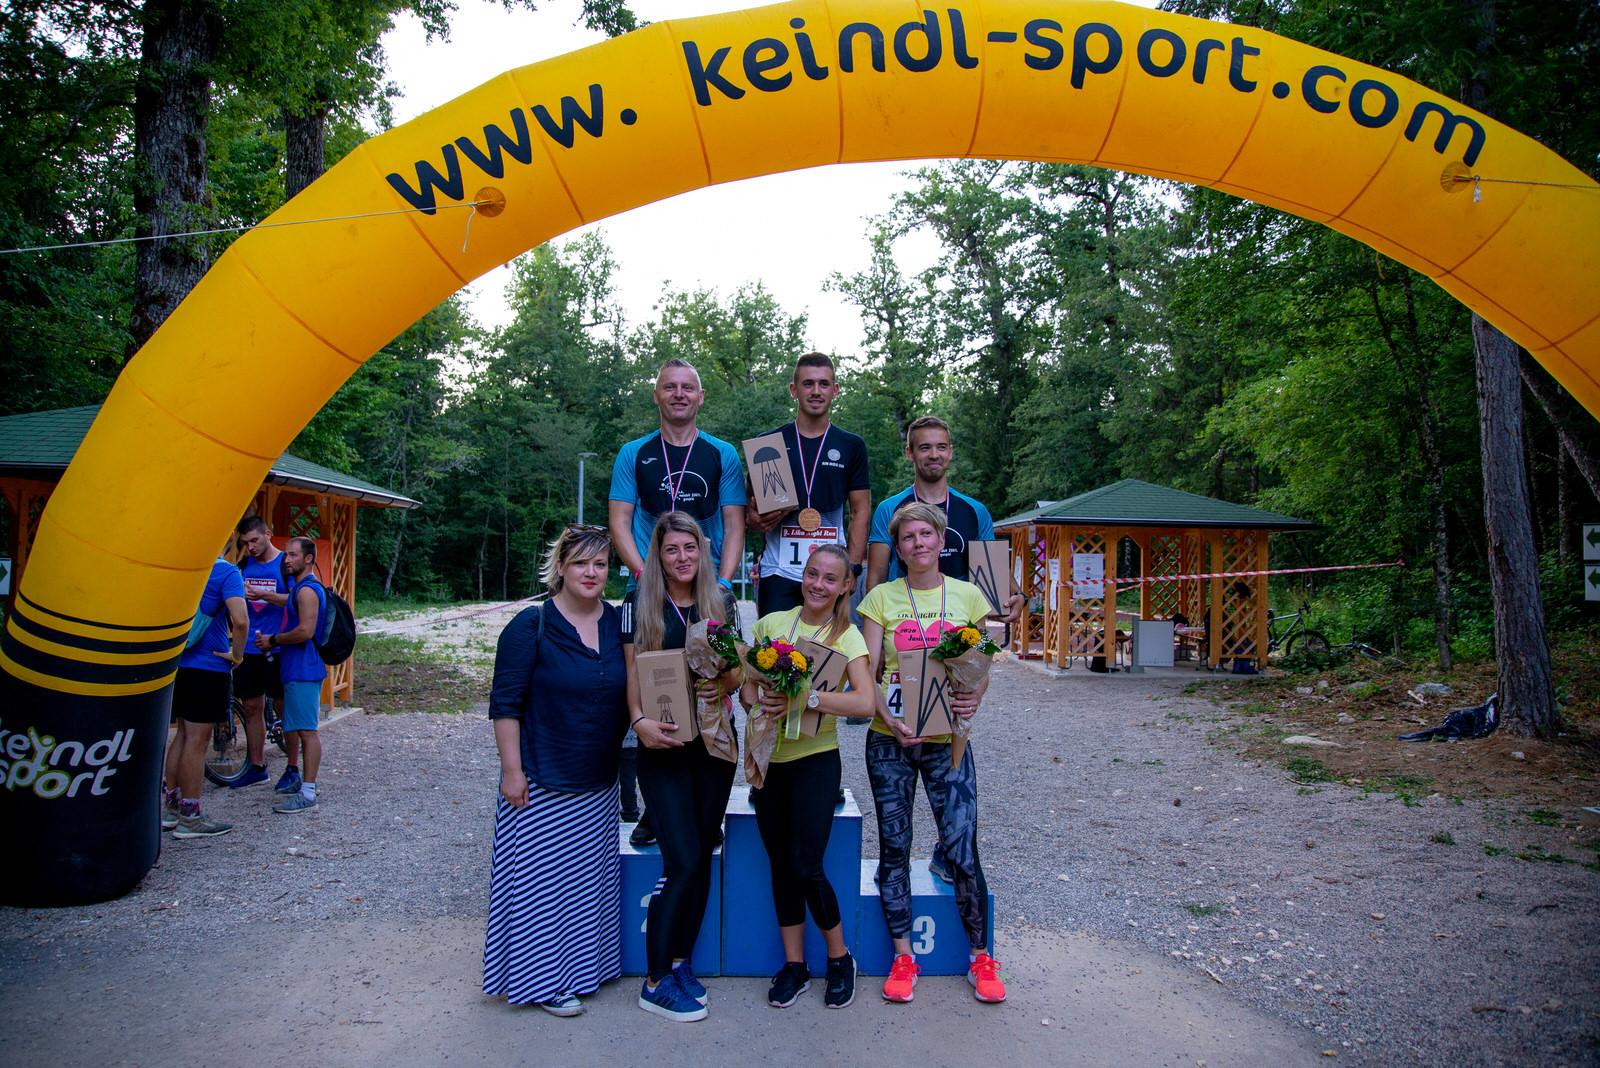 likaclub_lika night run_jasikovac_7_2020 (22)